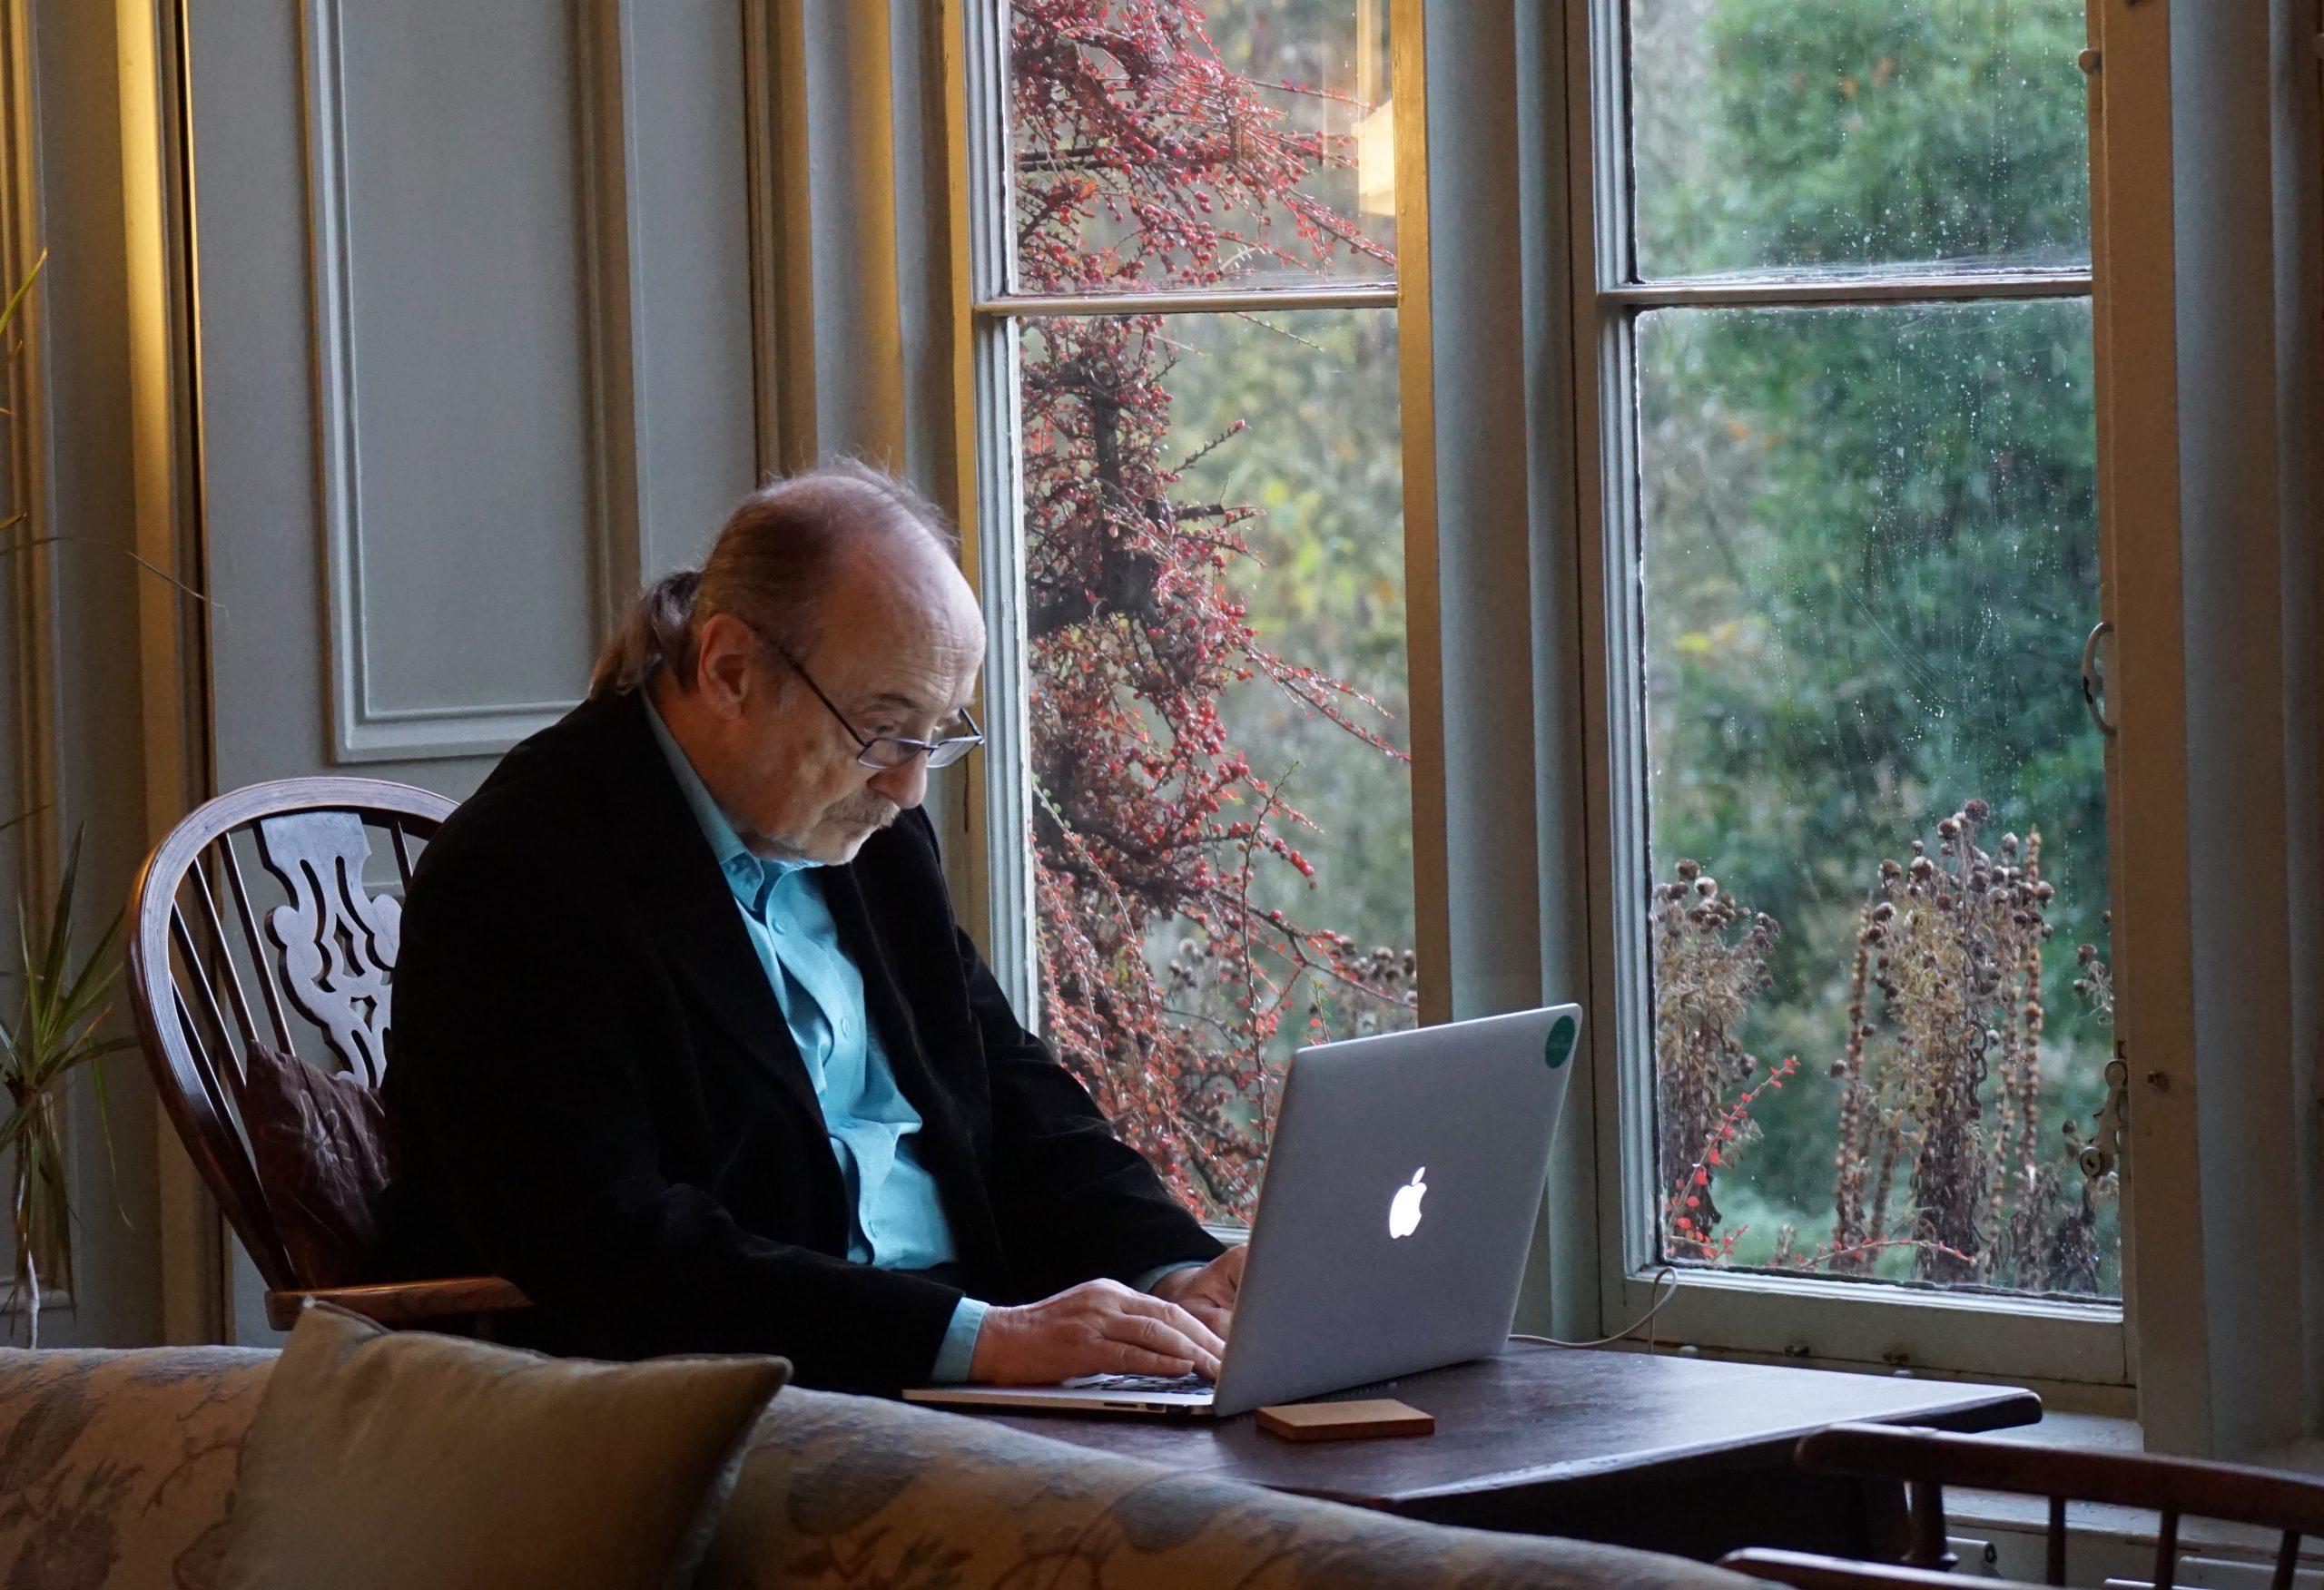 an older man working at a laptop